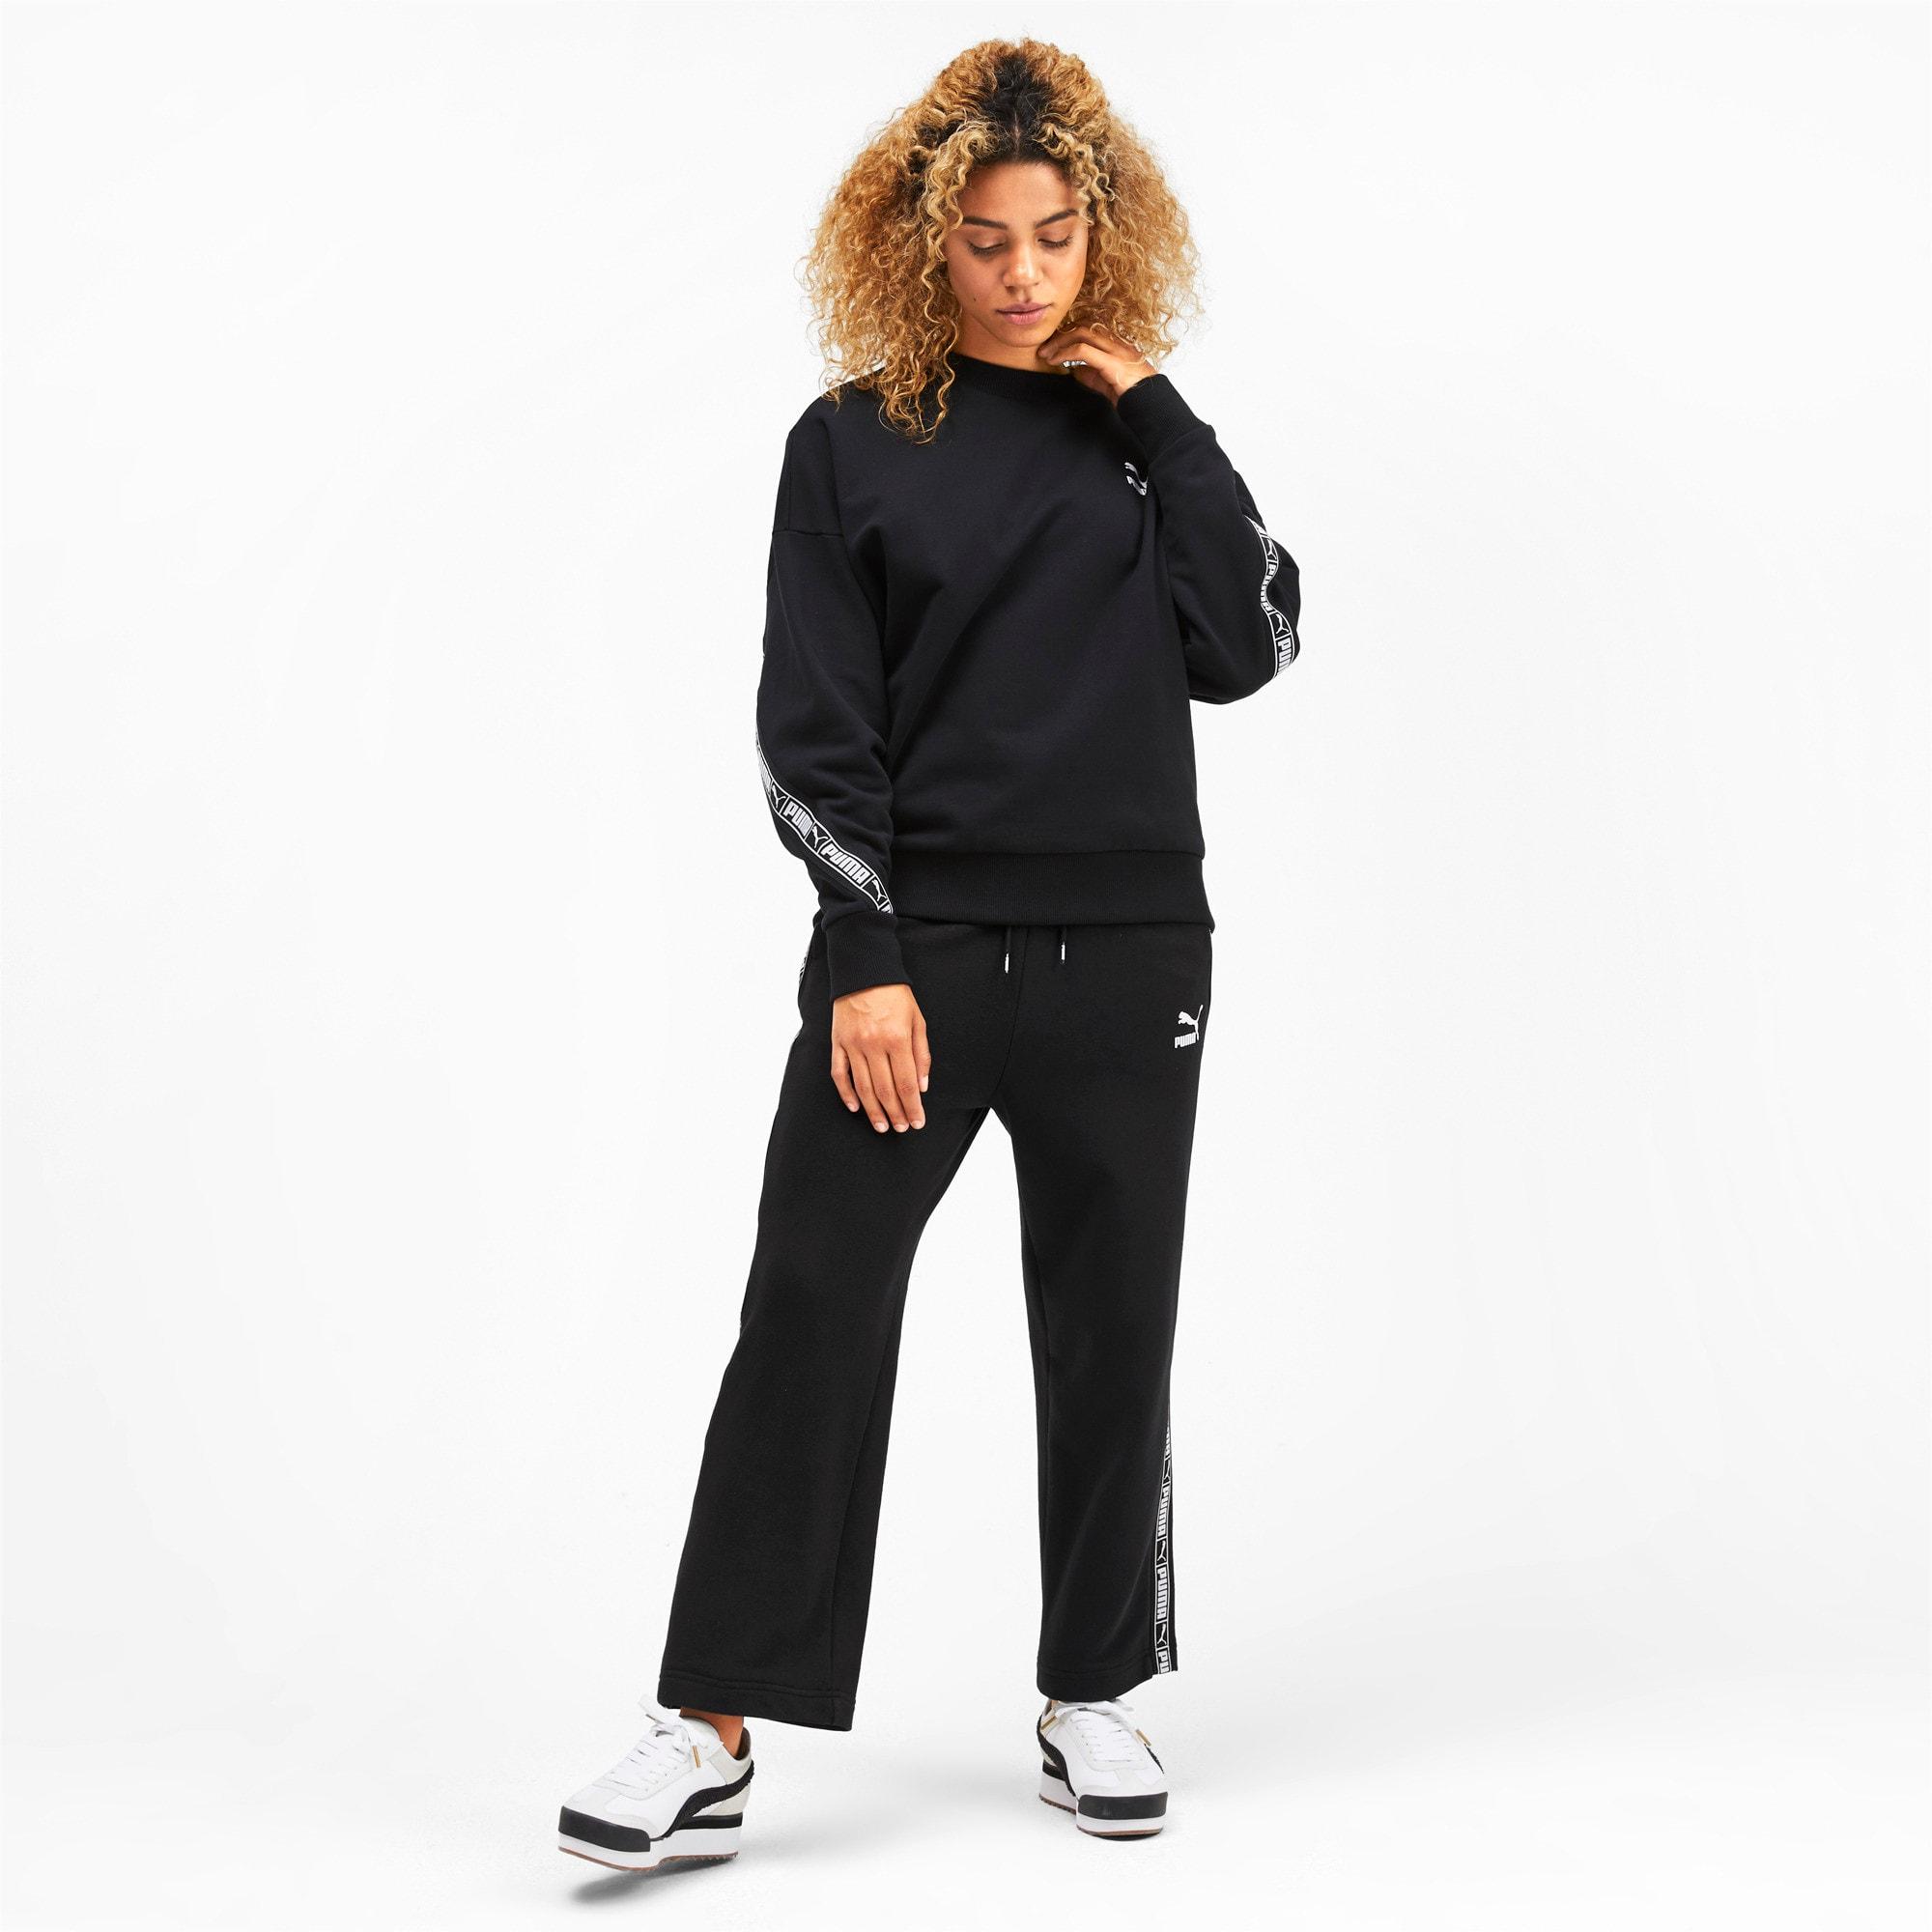 Thumbnail 4 of Classics Women's Track Pants, Puma Black, medium